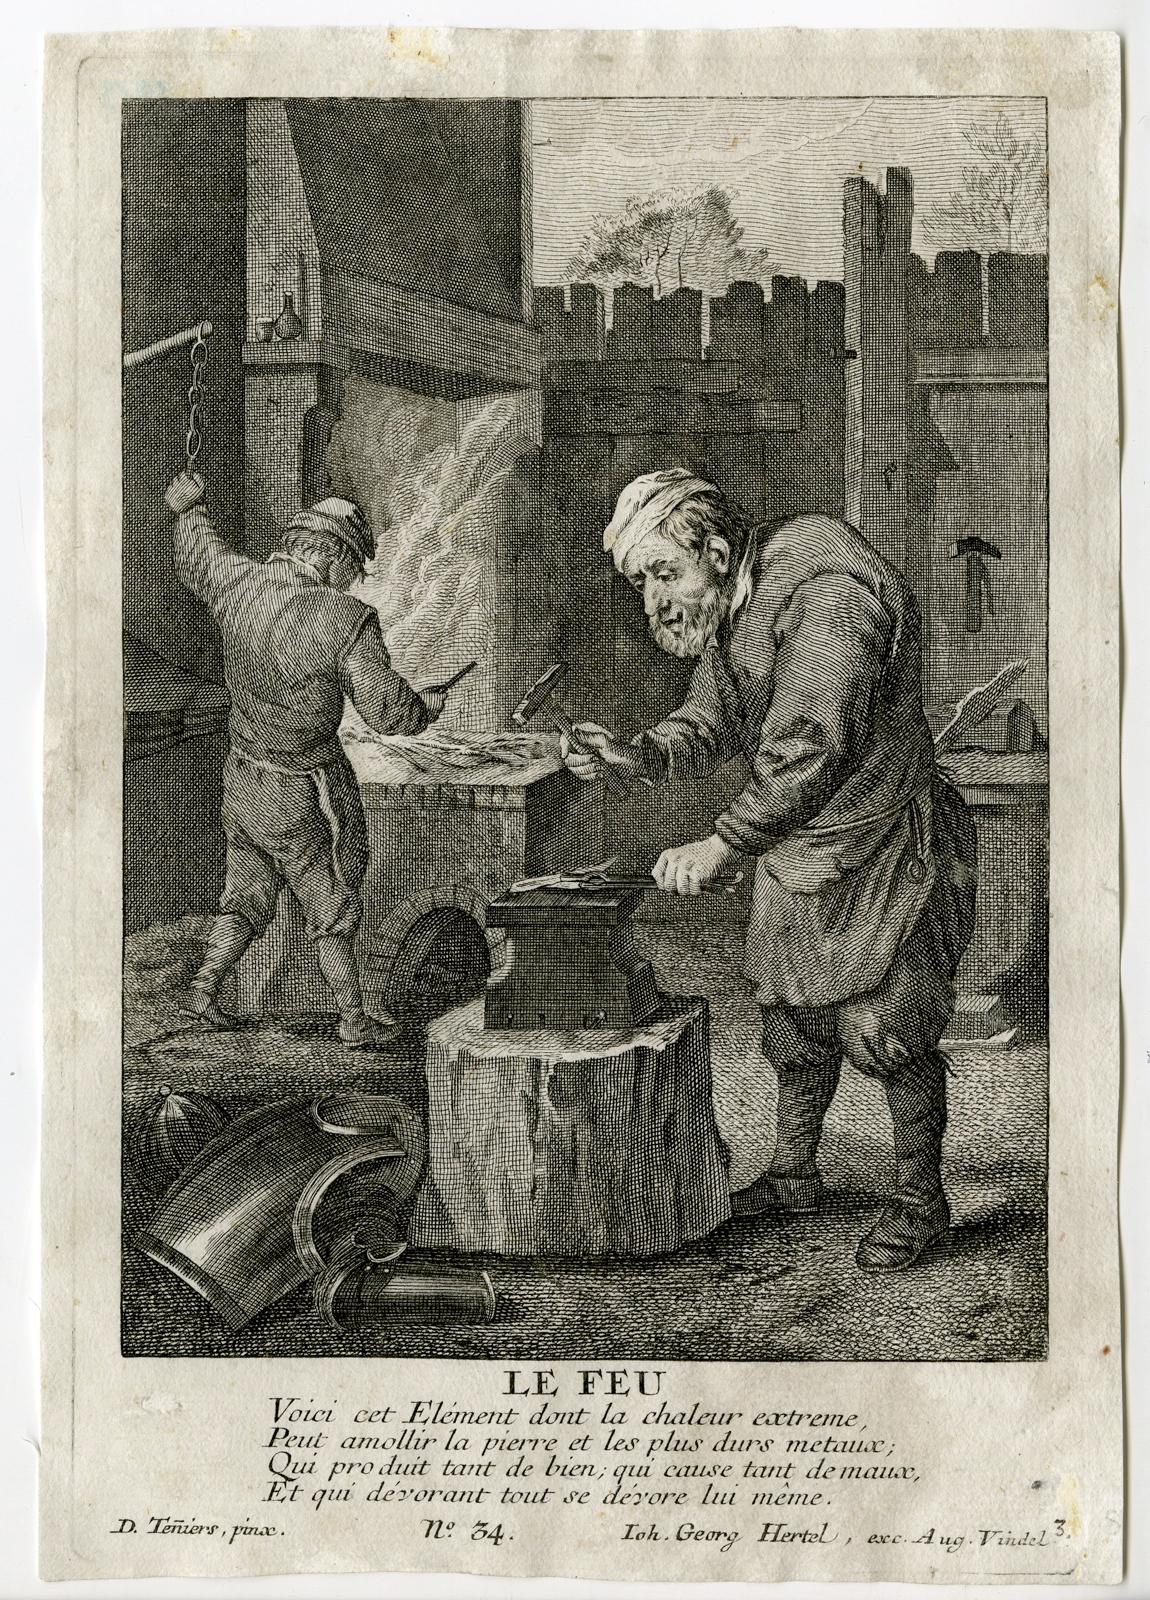 Antique Master Print-BLACKSMITH-SMITHY-FIRE ELEMENT-Teniers II-Hertel-c.1750: Johann Georg Hertel